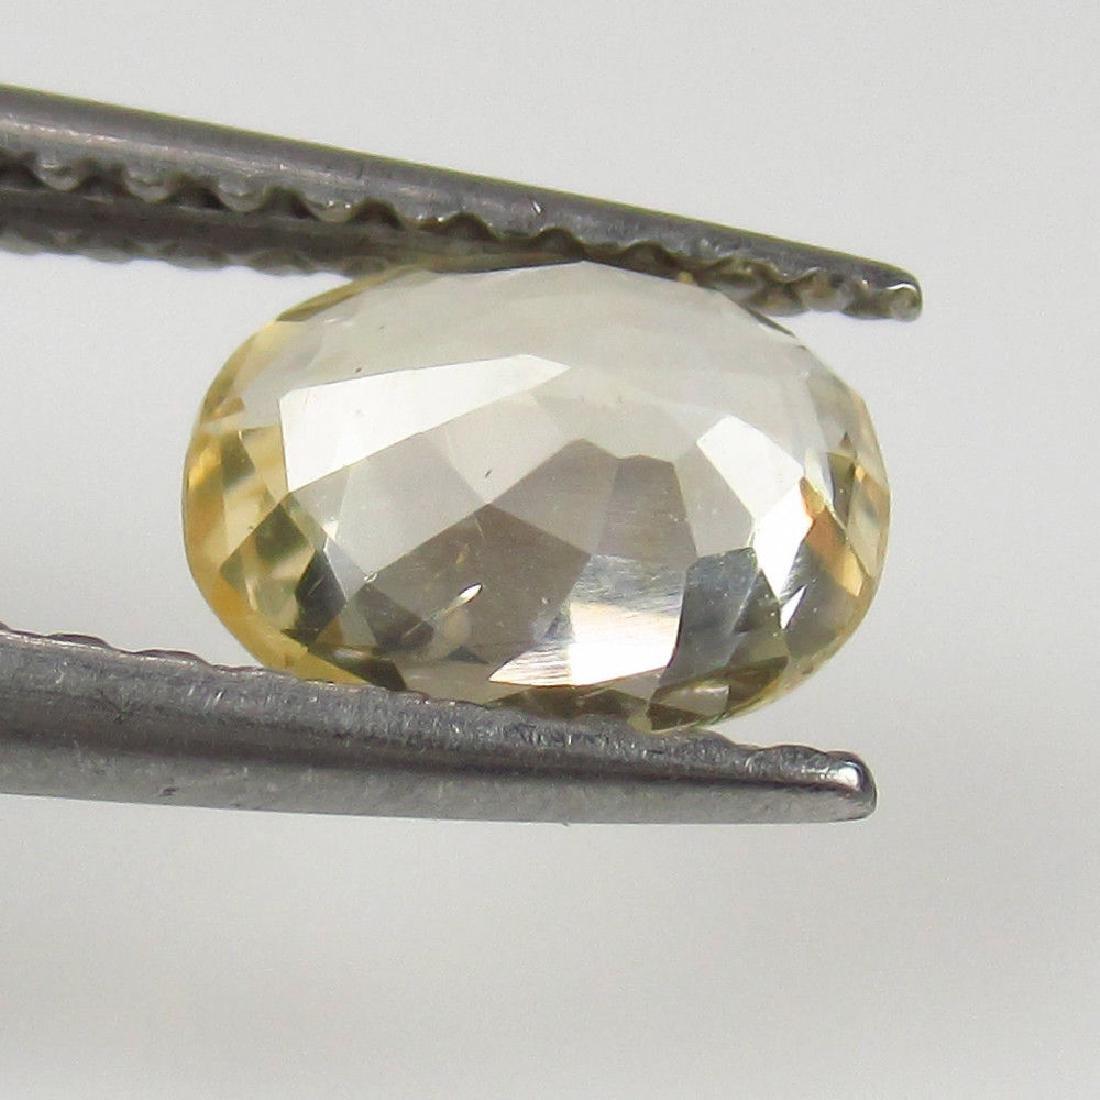 0.86 Ct Genuine Ceylon Yellow Sapphire Top Quality - 2